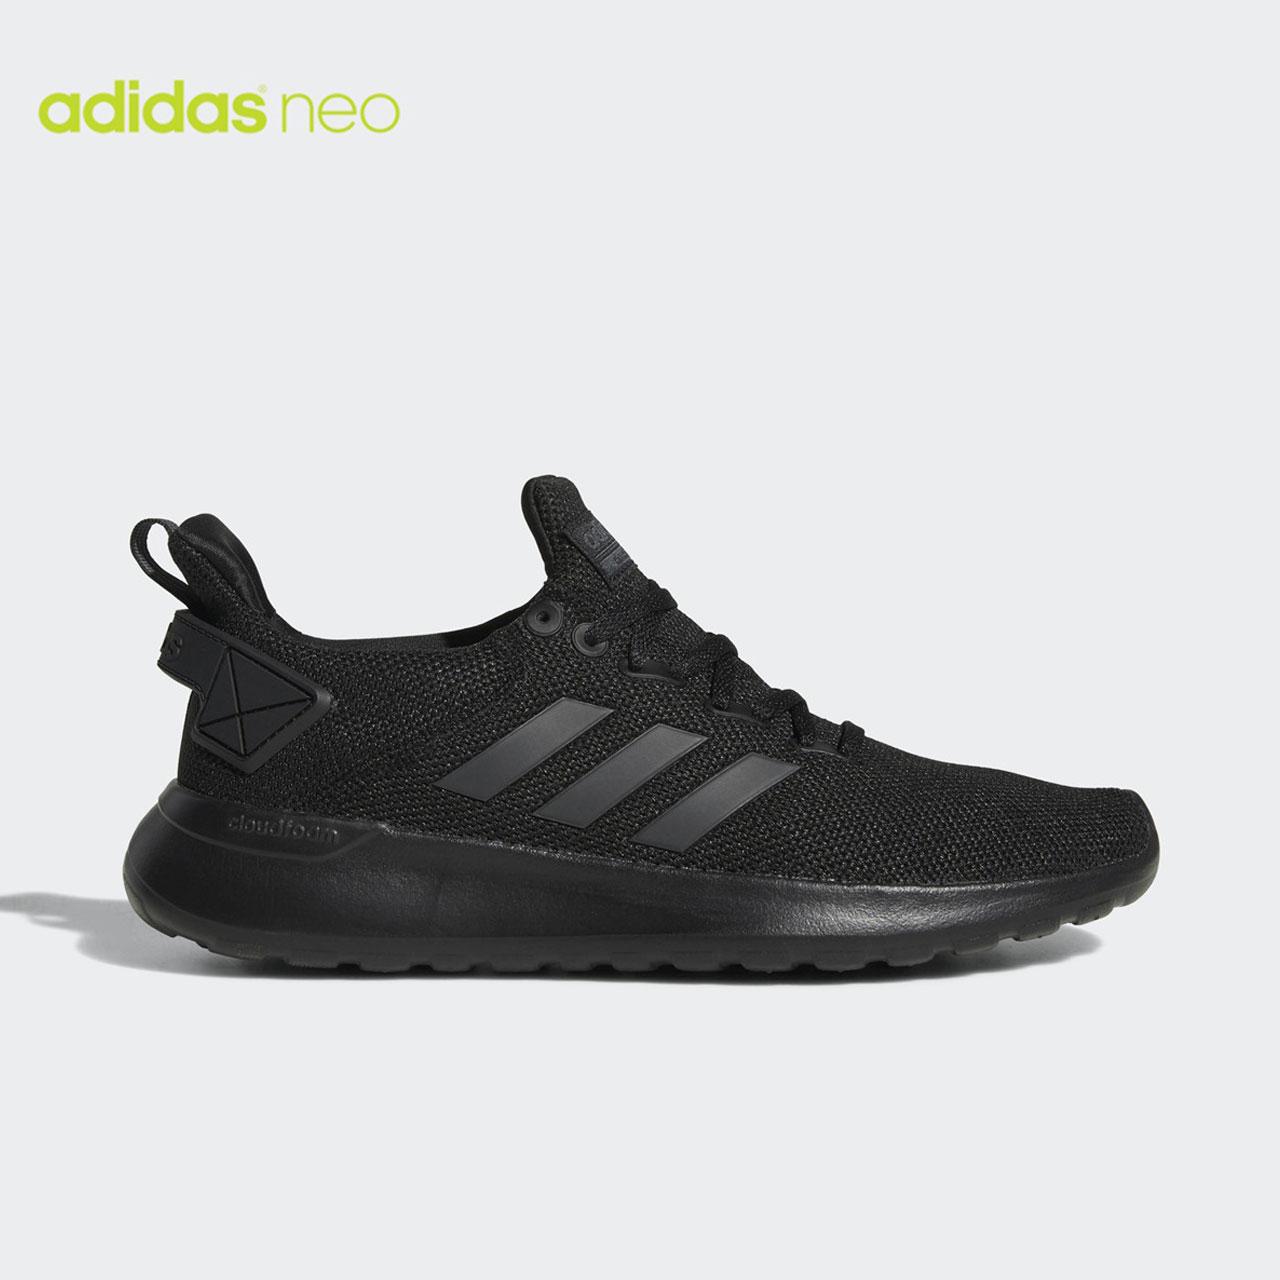 Adidas/阿迪达斯男鞋LITE RACER黑白网面运动跑步休闲鞋 AC7828